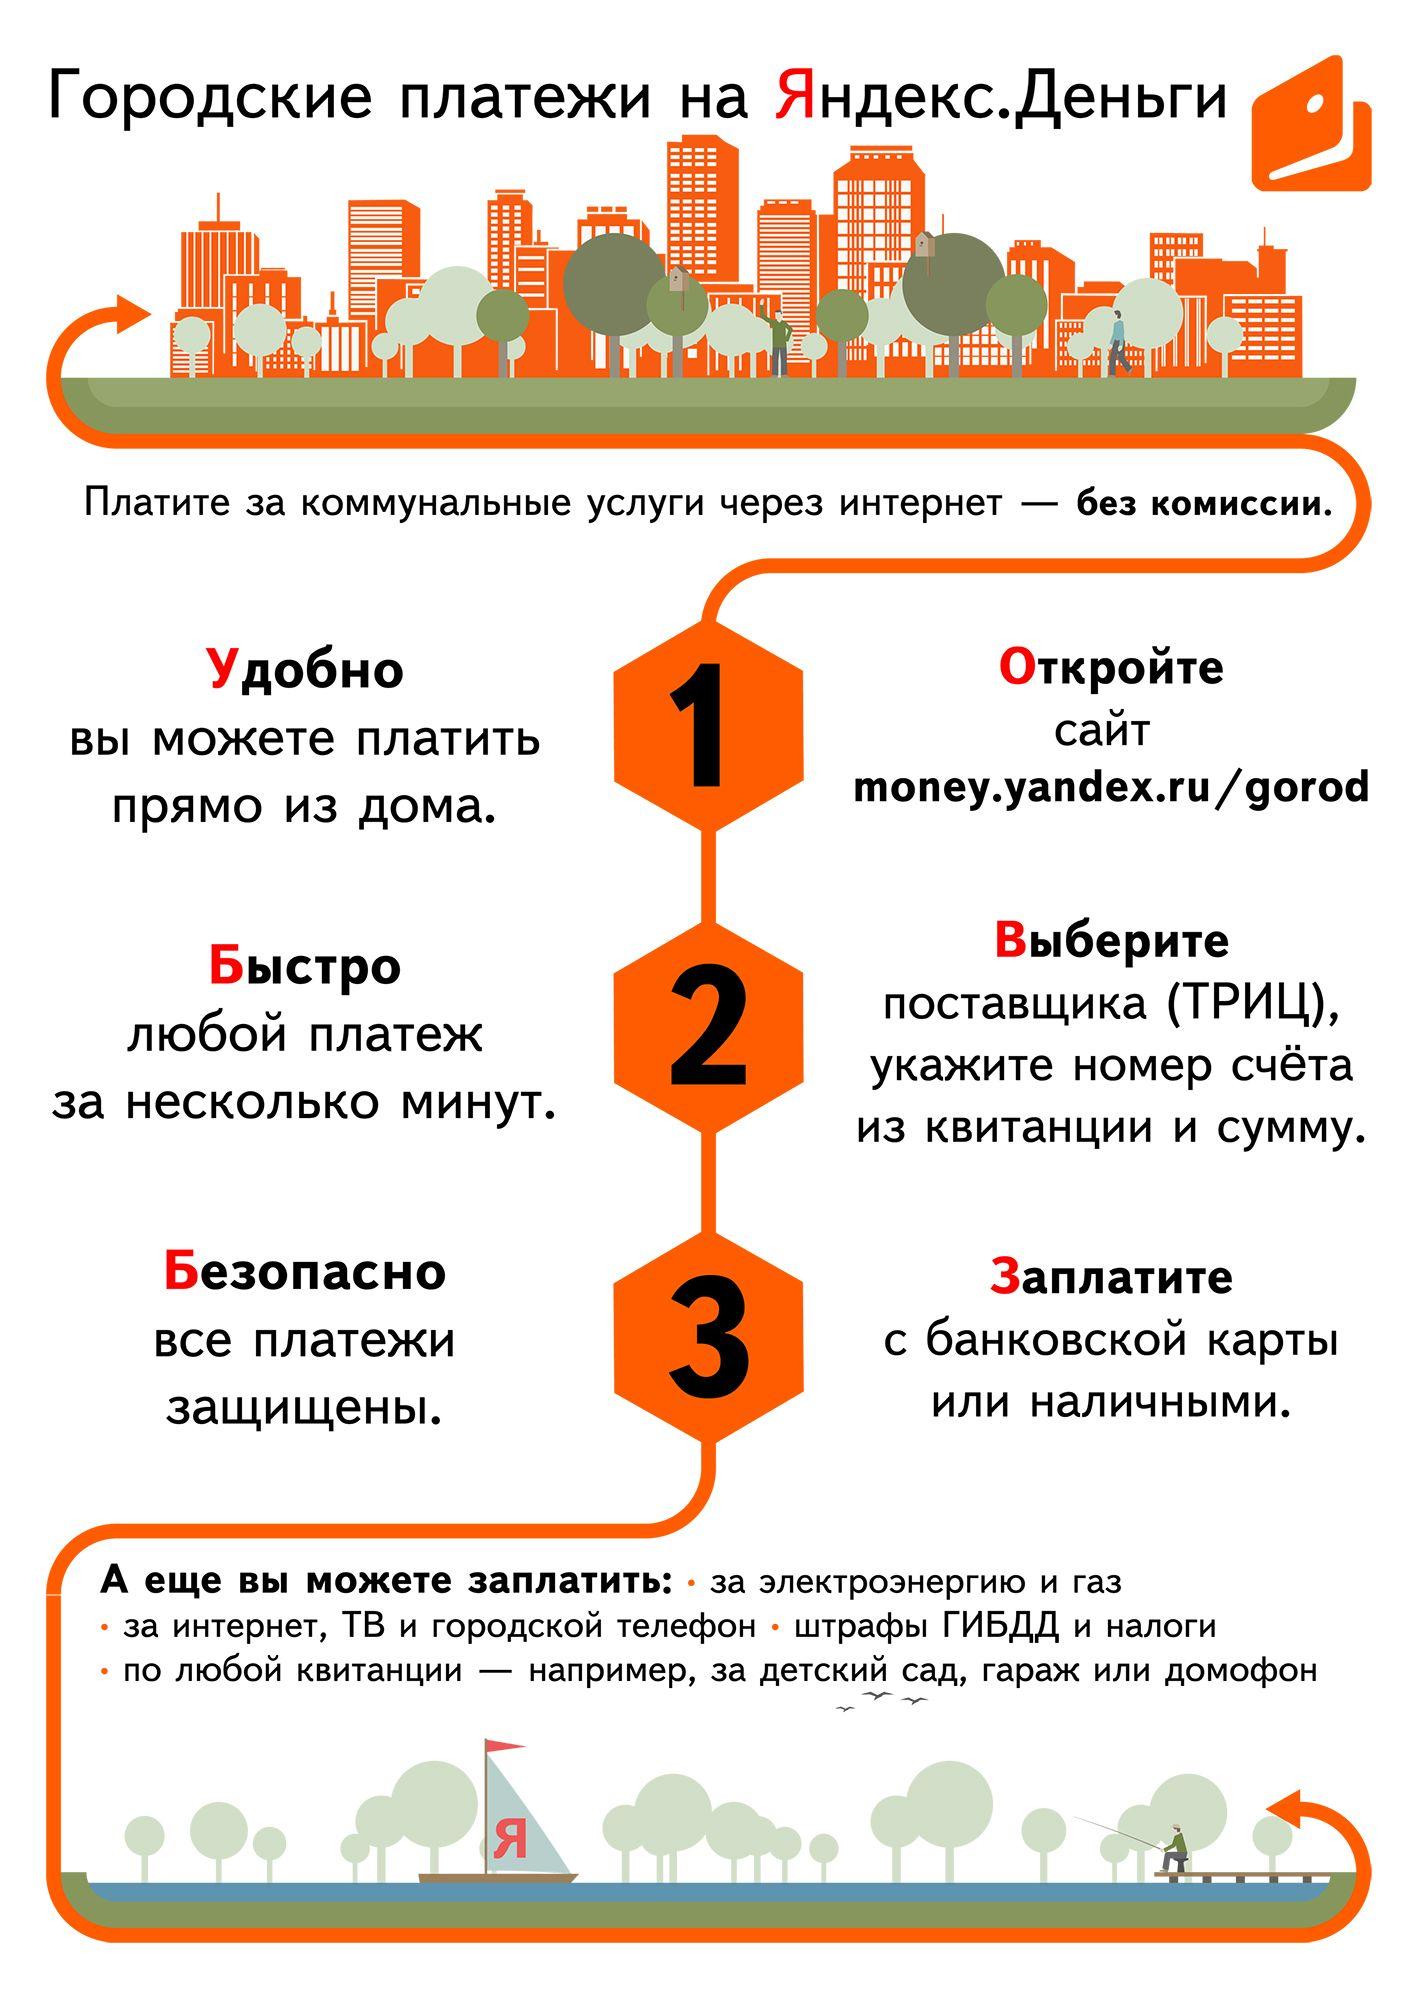 Реклама Яндекс.Денег для оплаты ЖКХ - дизайнер Gas-Min